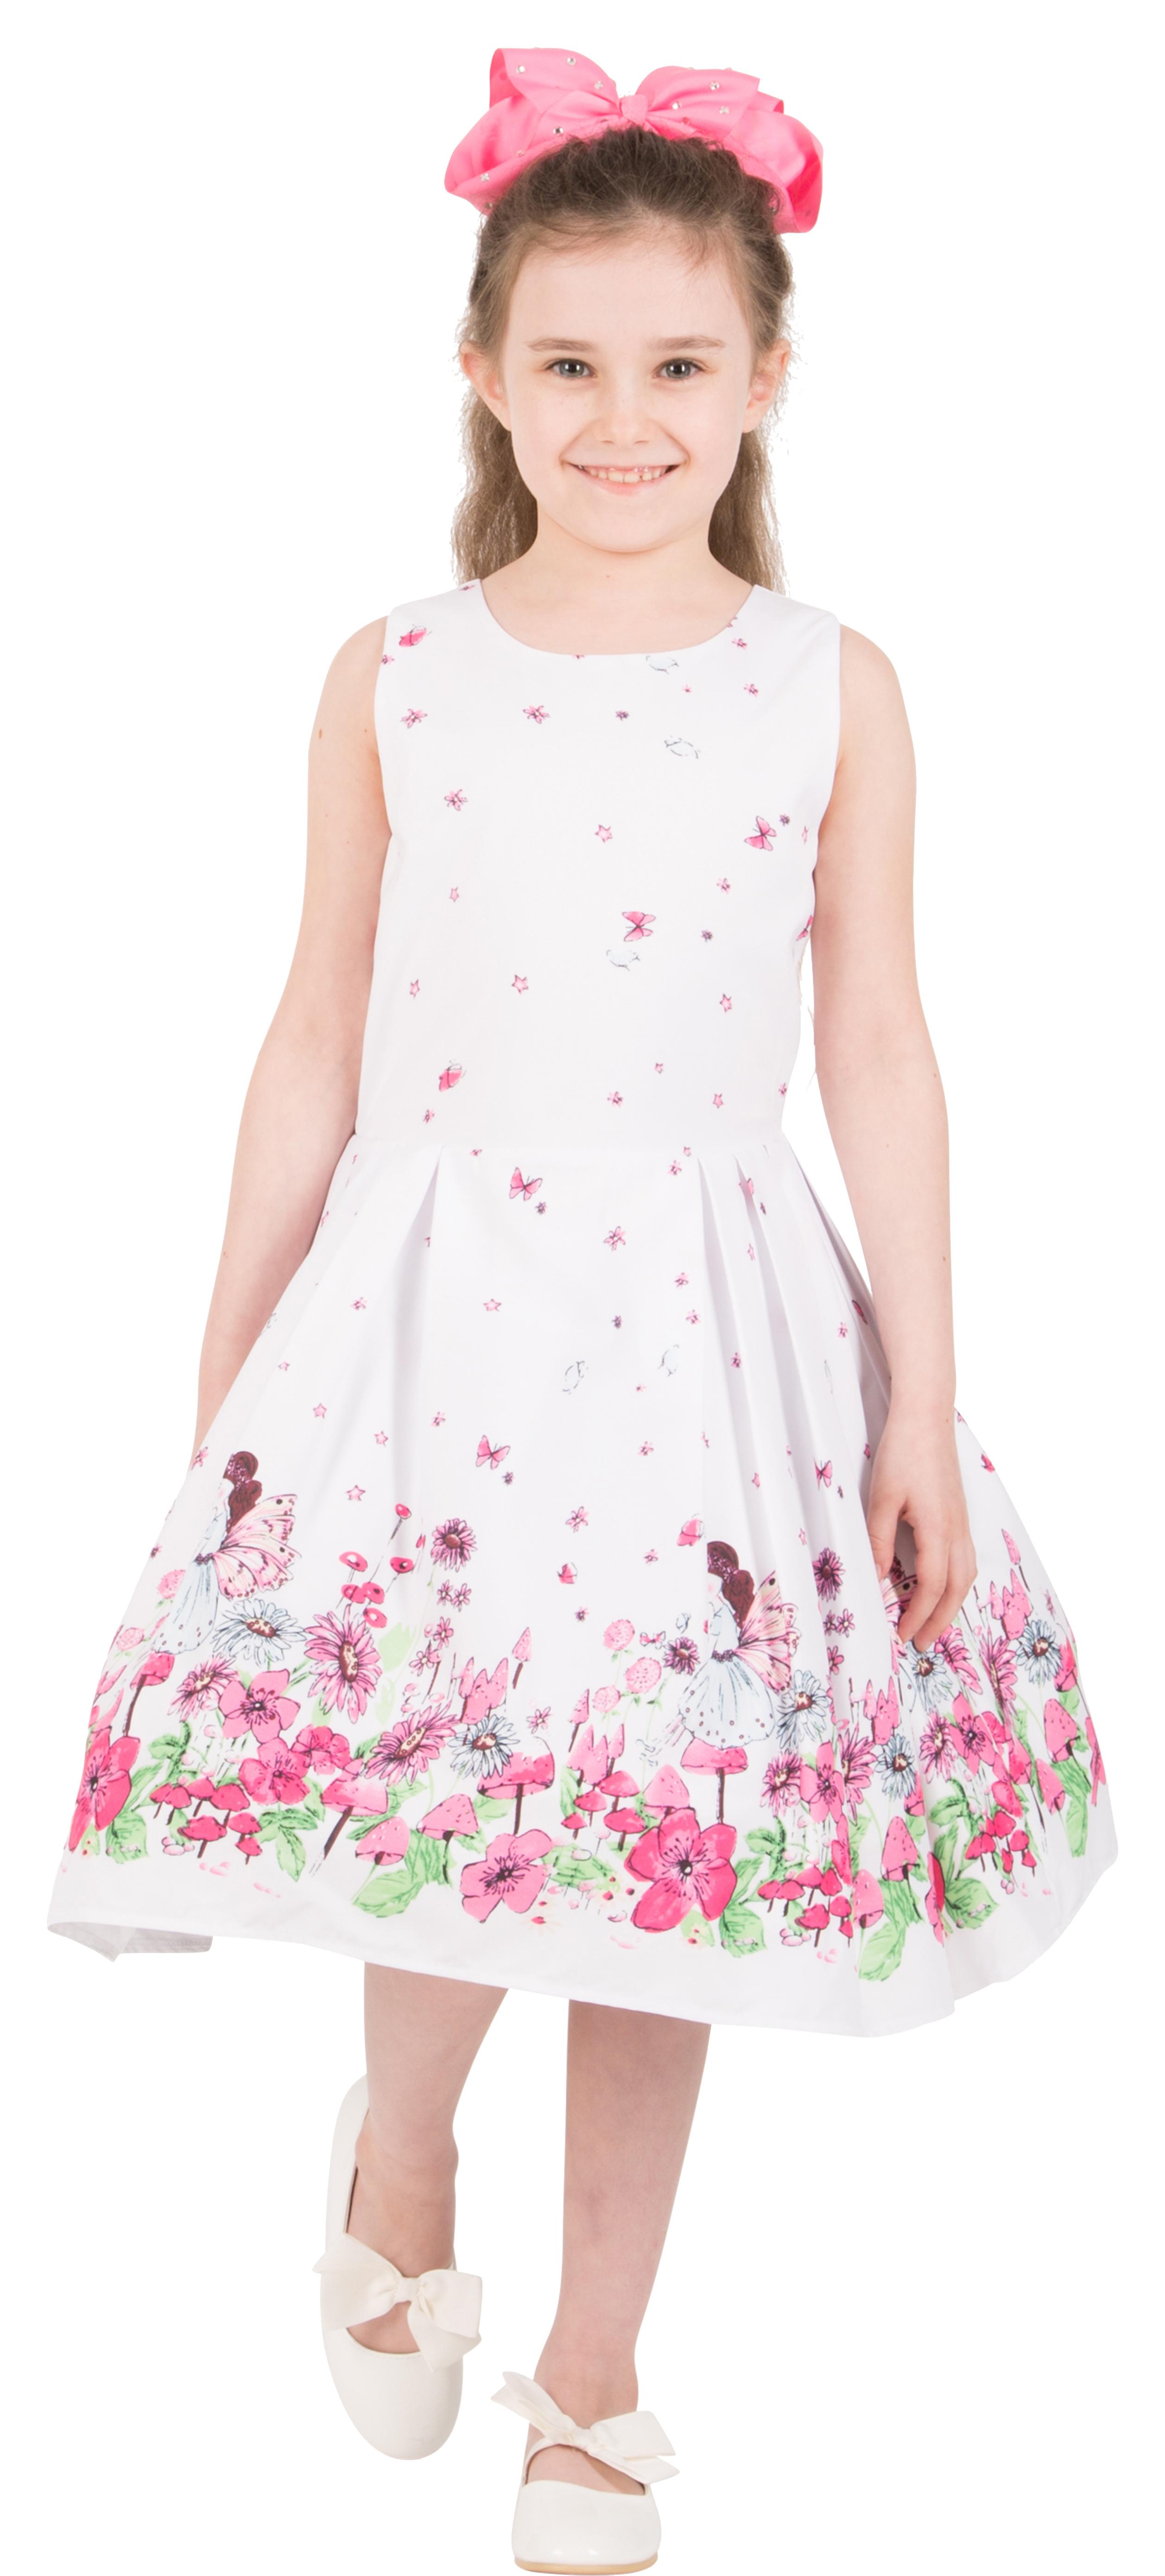 BlackButterfly Kids  Kira  Vintage 50 s Party Girls Prom Dress  c69c14c5774